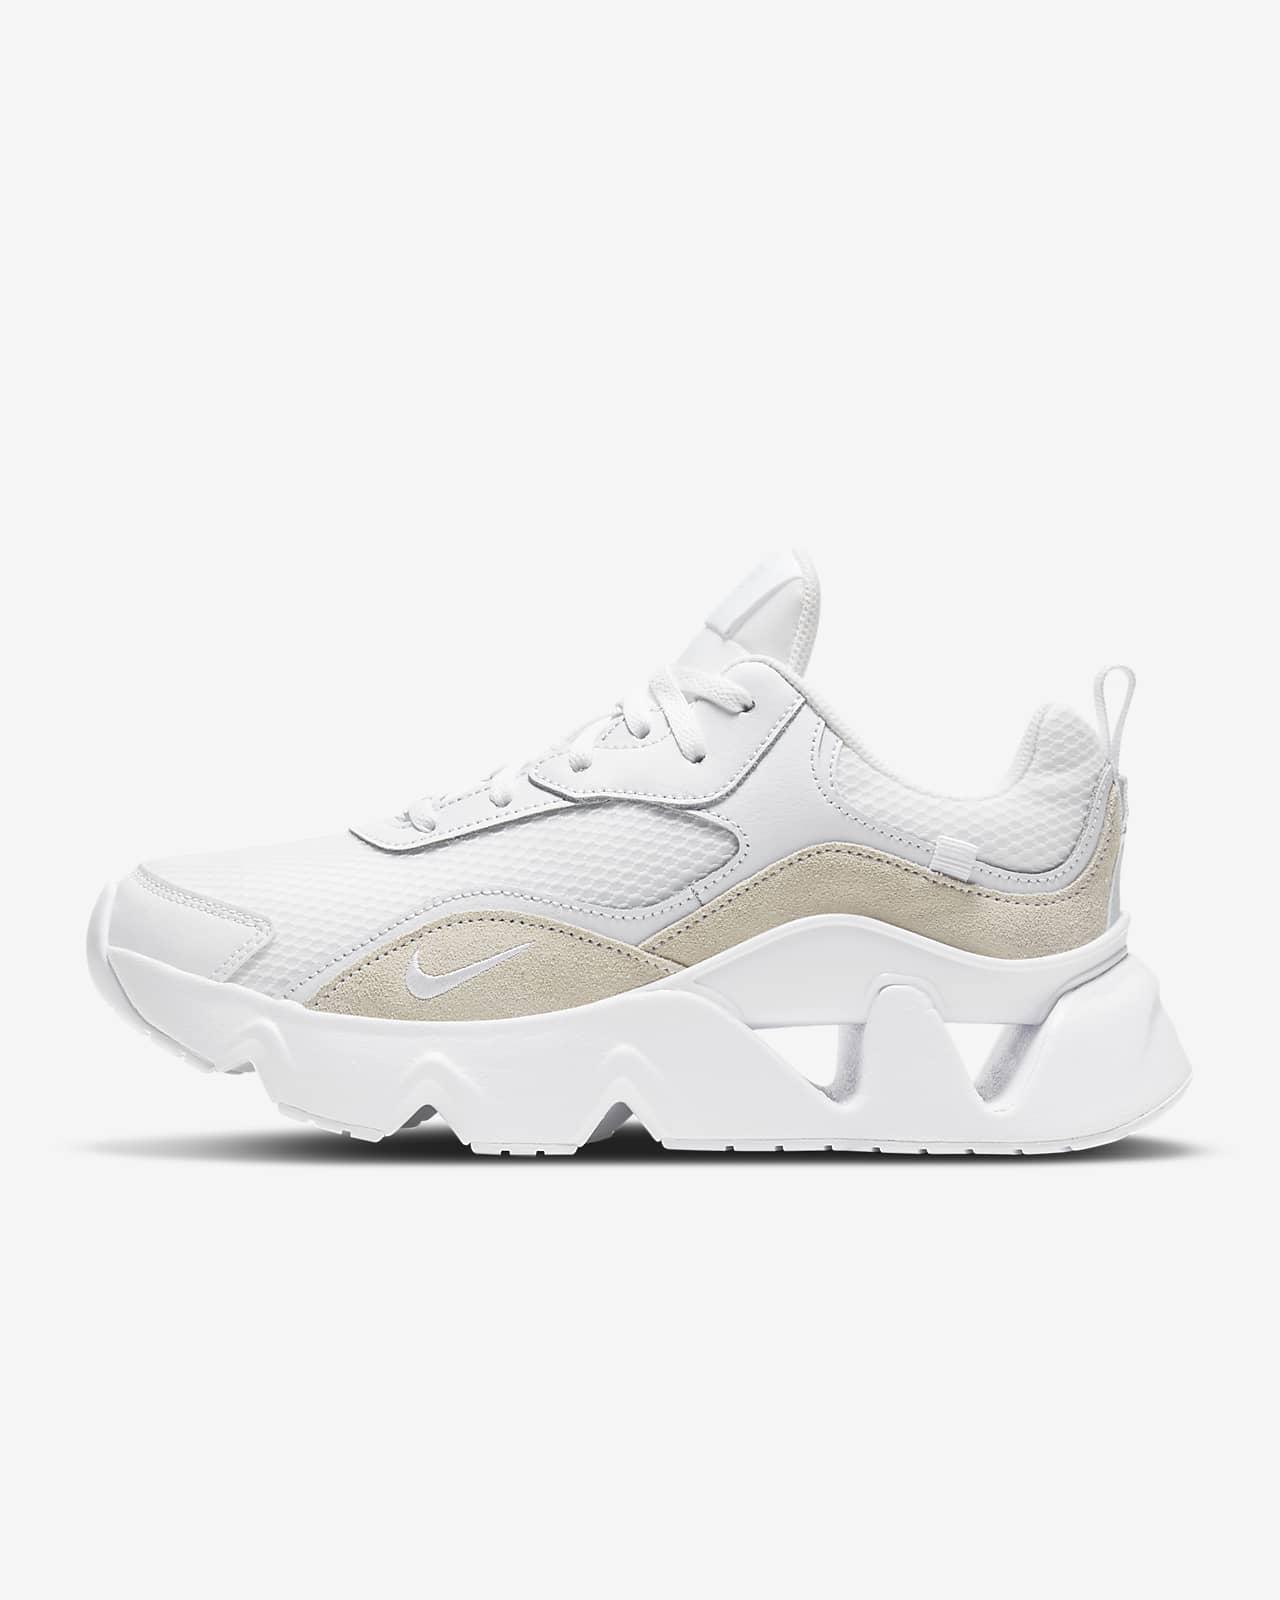 Nike Ryz 365 2 Women's Shoe